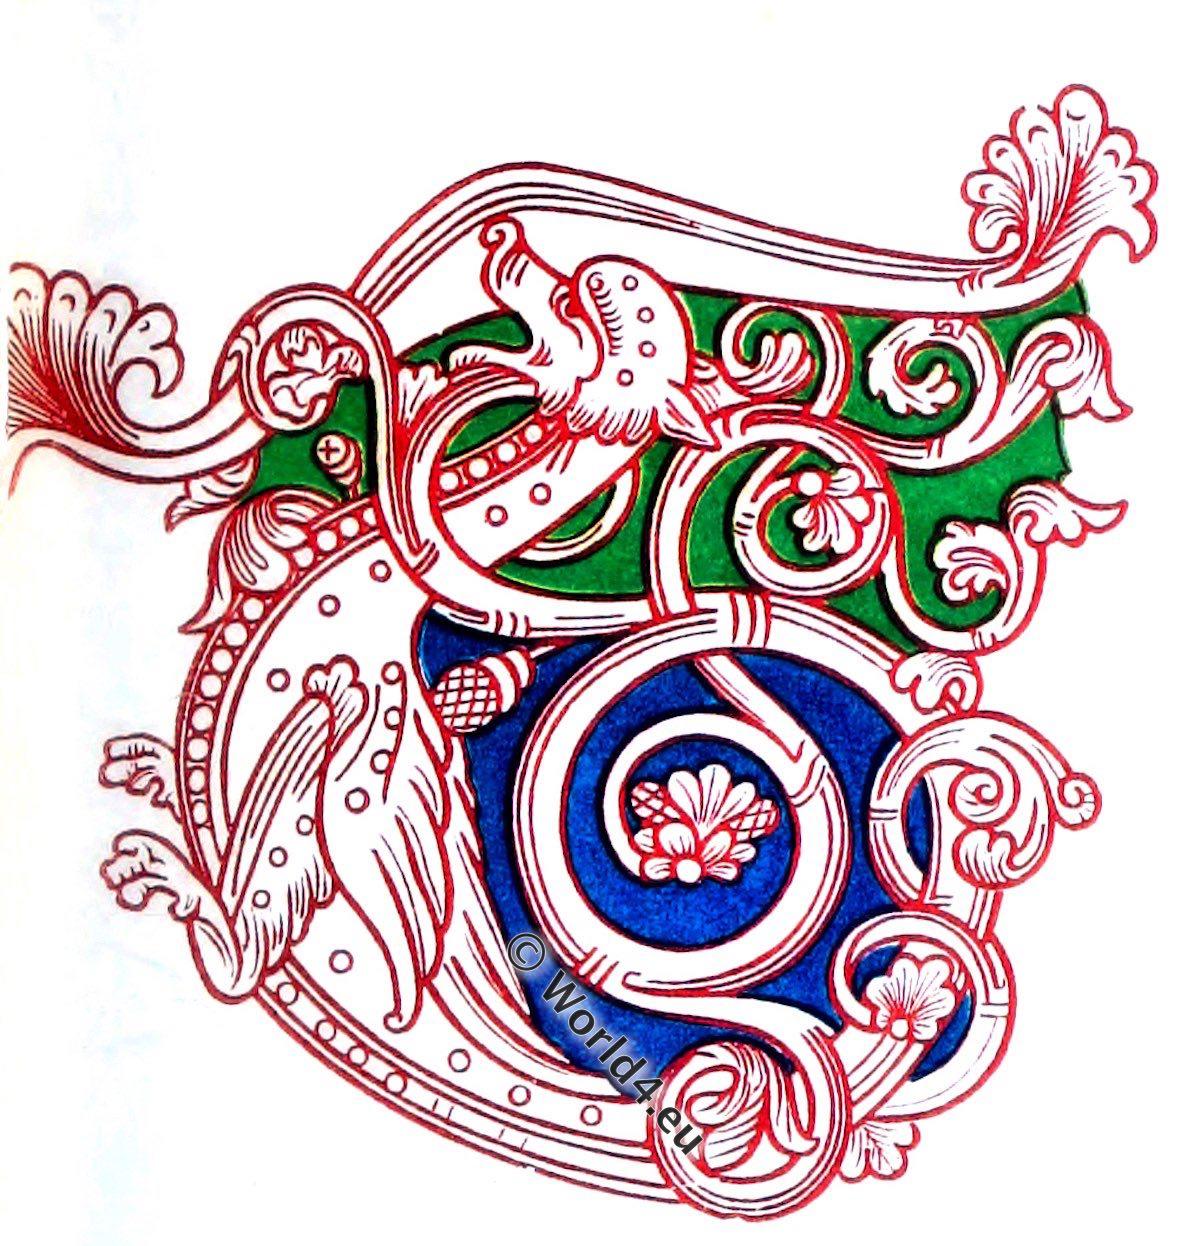 12th century, illuminated manuscript, Bible, middle ages,